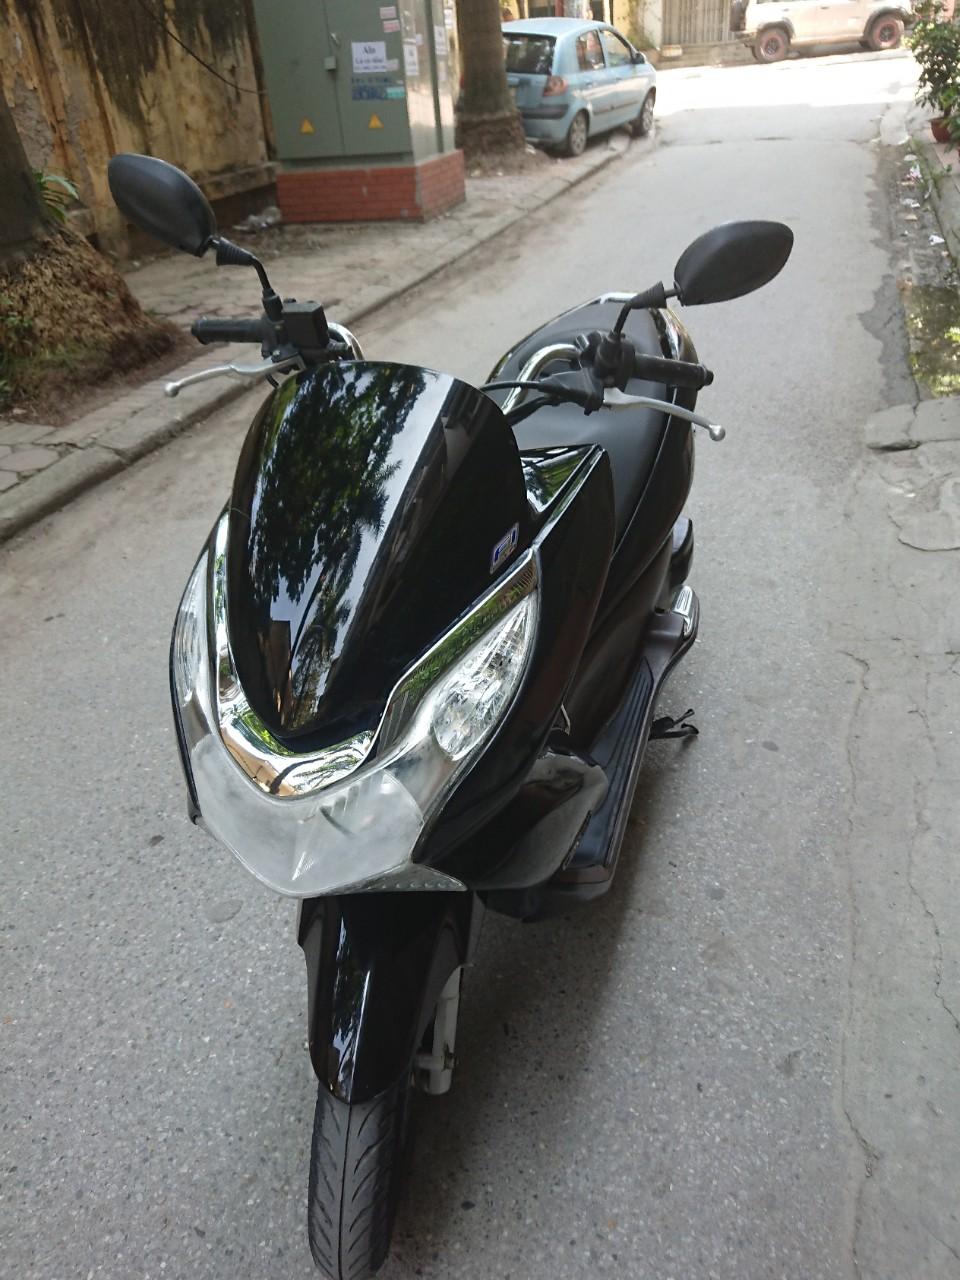 Rao ban Honda Pcx 125 fi nhap khau Thai 2011 nguyen ban chinh chu su dung